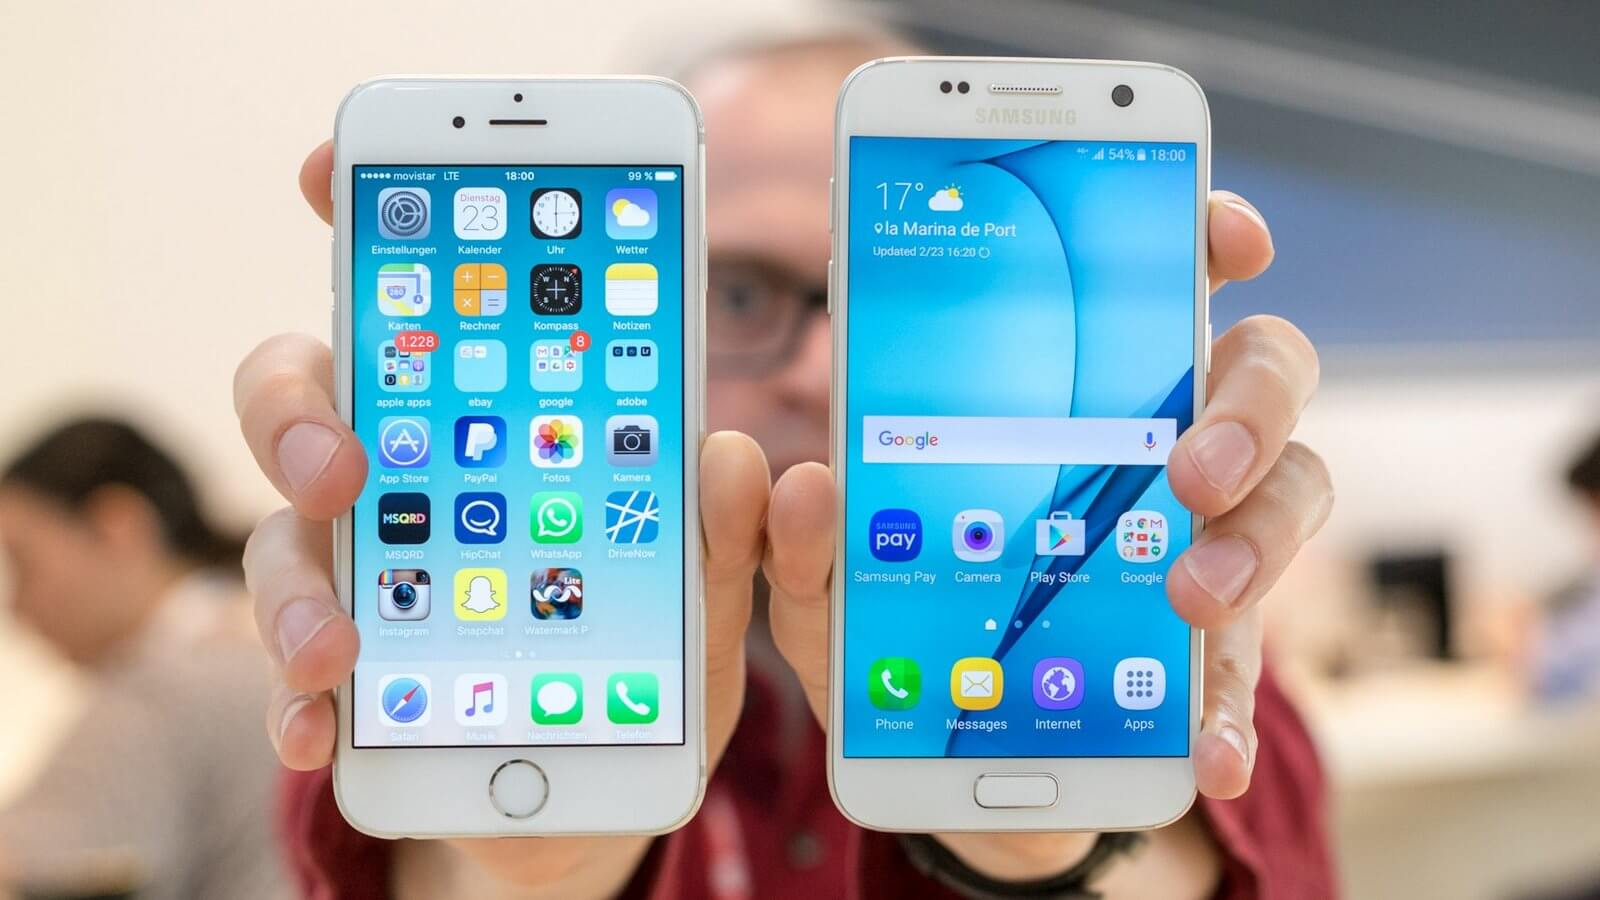 iPhone 6 vs. Galaxy S7